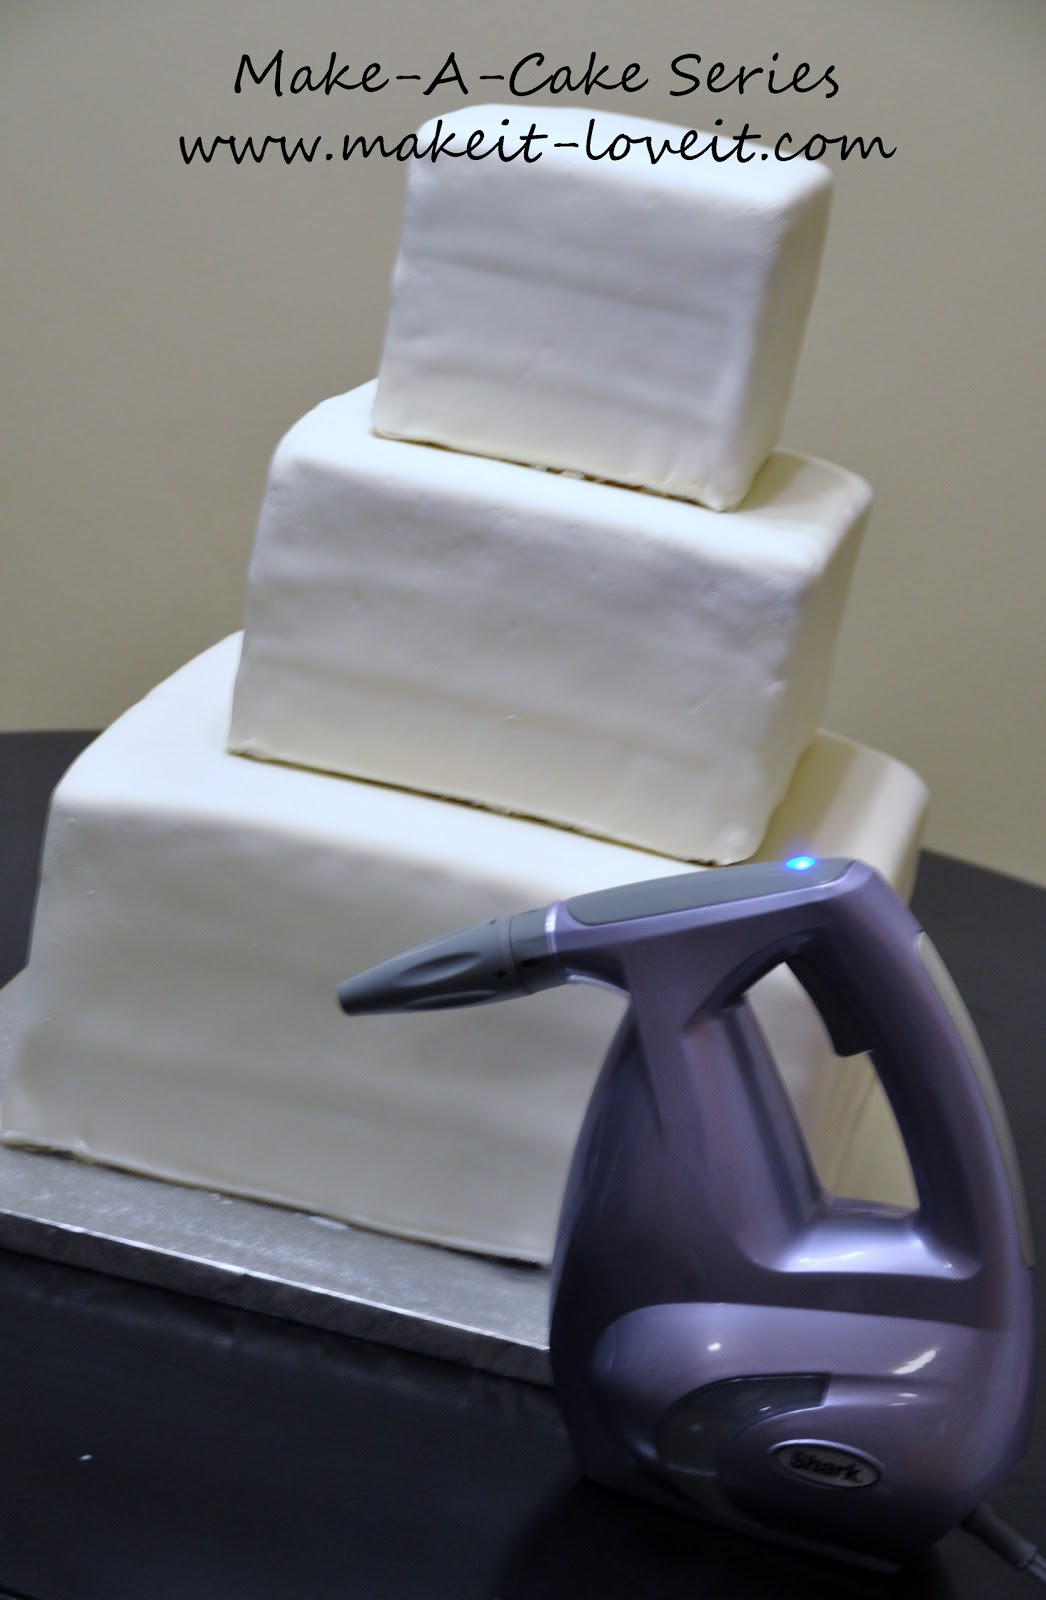 Shields s blog Wedding Cake Serving Chart